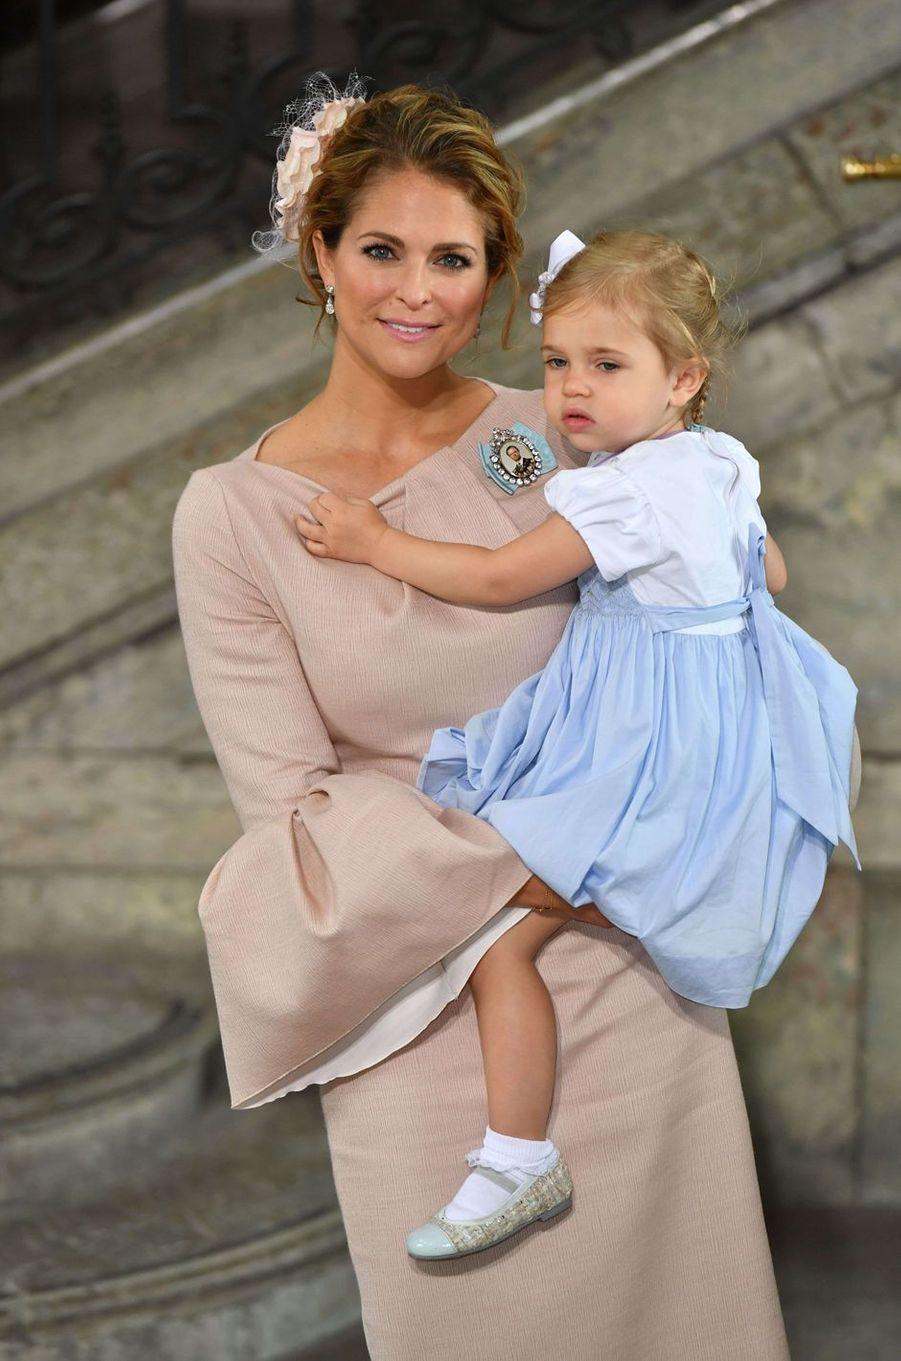 La princesse Madeleine de Suède avec la princesse Leonore, le 27 mai 2016